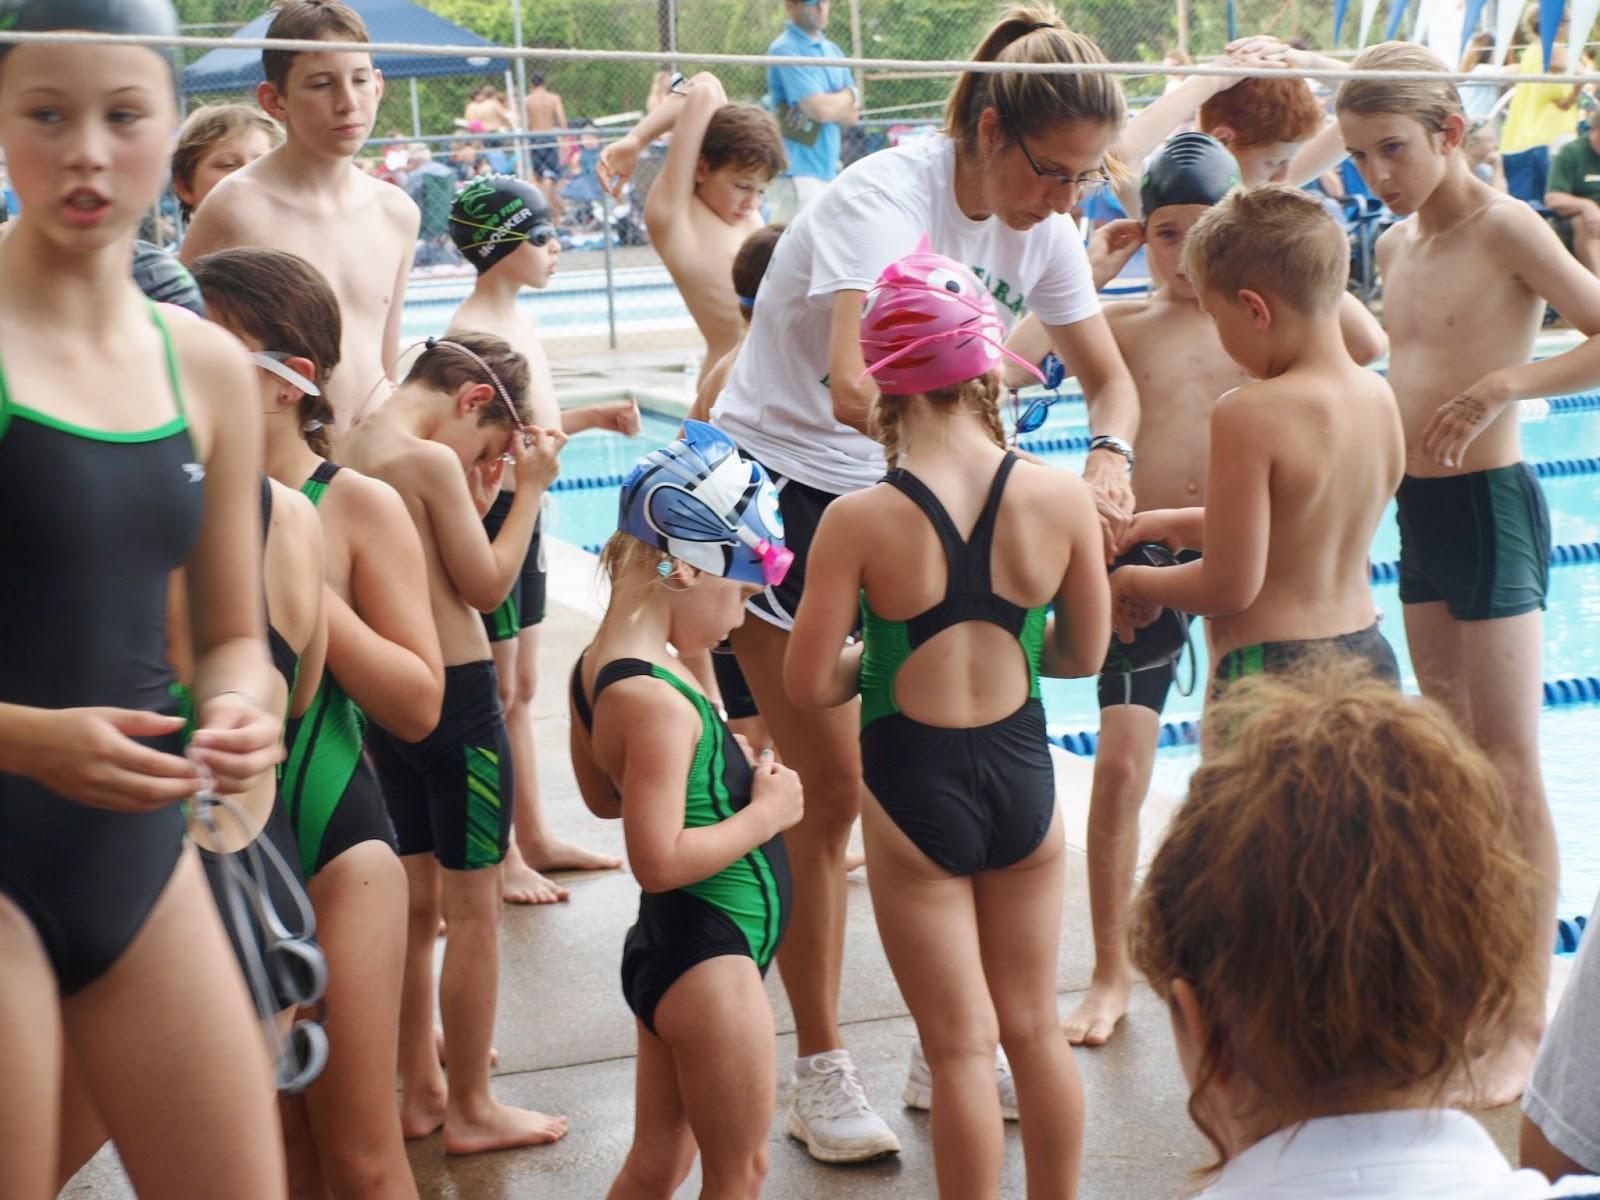 girls swim team pubes